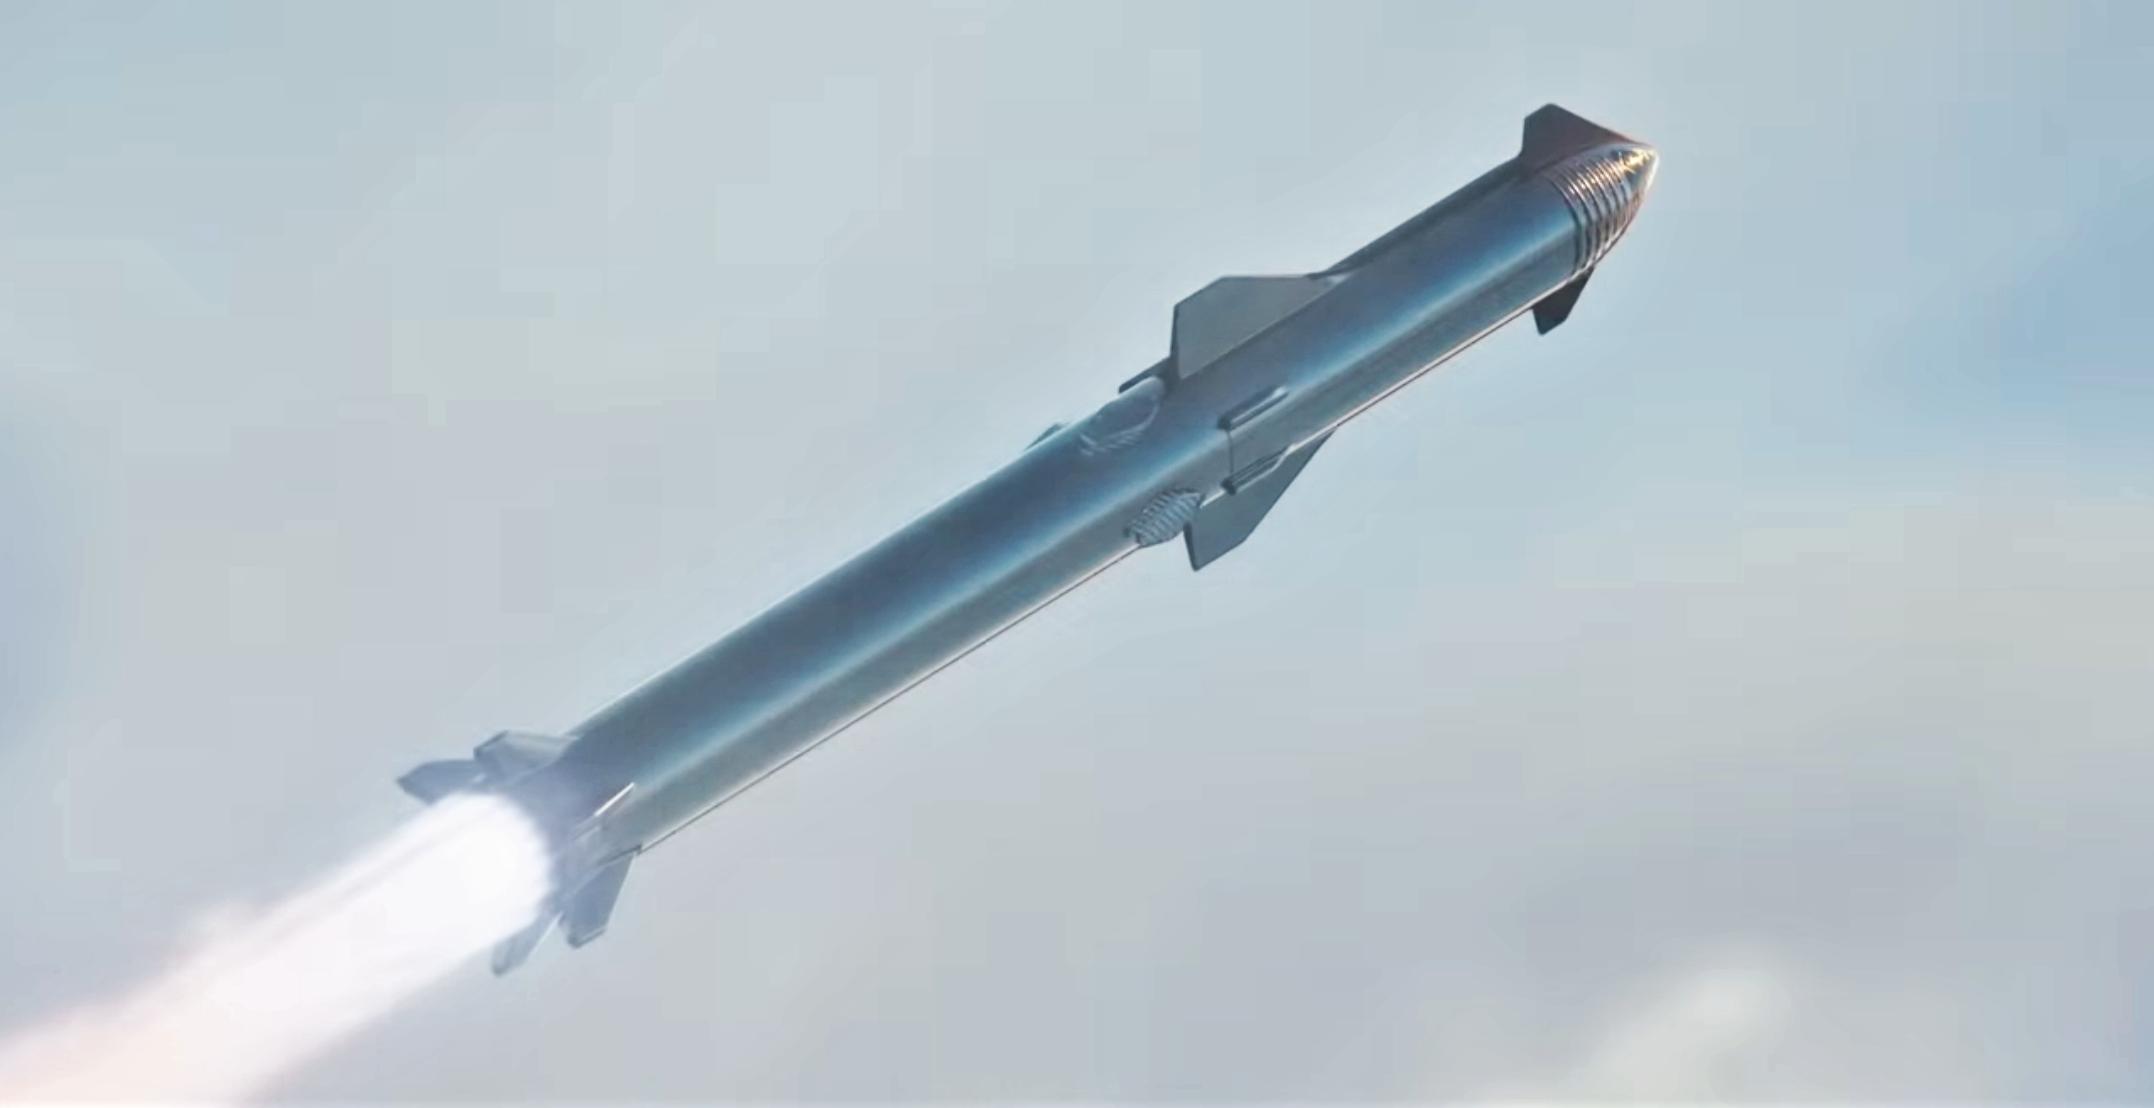 Starship Super Heavy 2019 (SpaceX) Max Q 3 crop